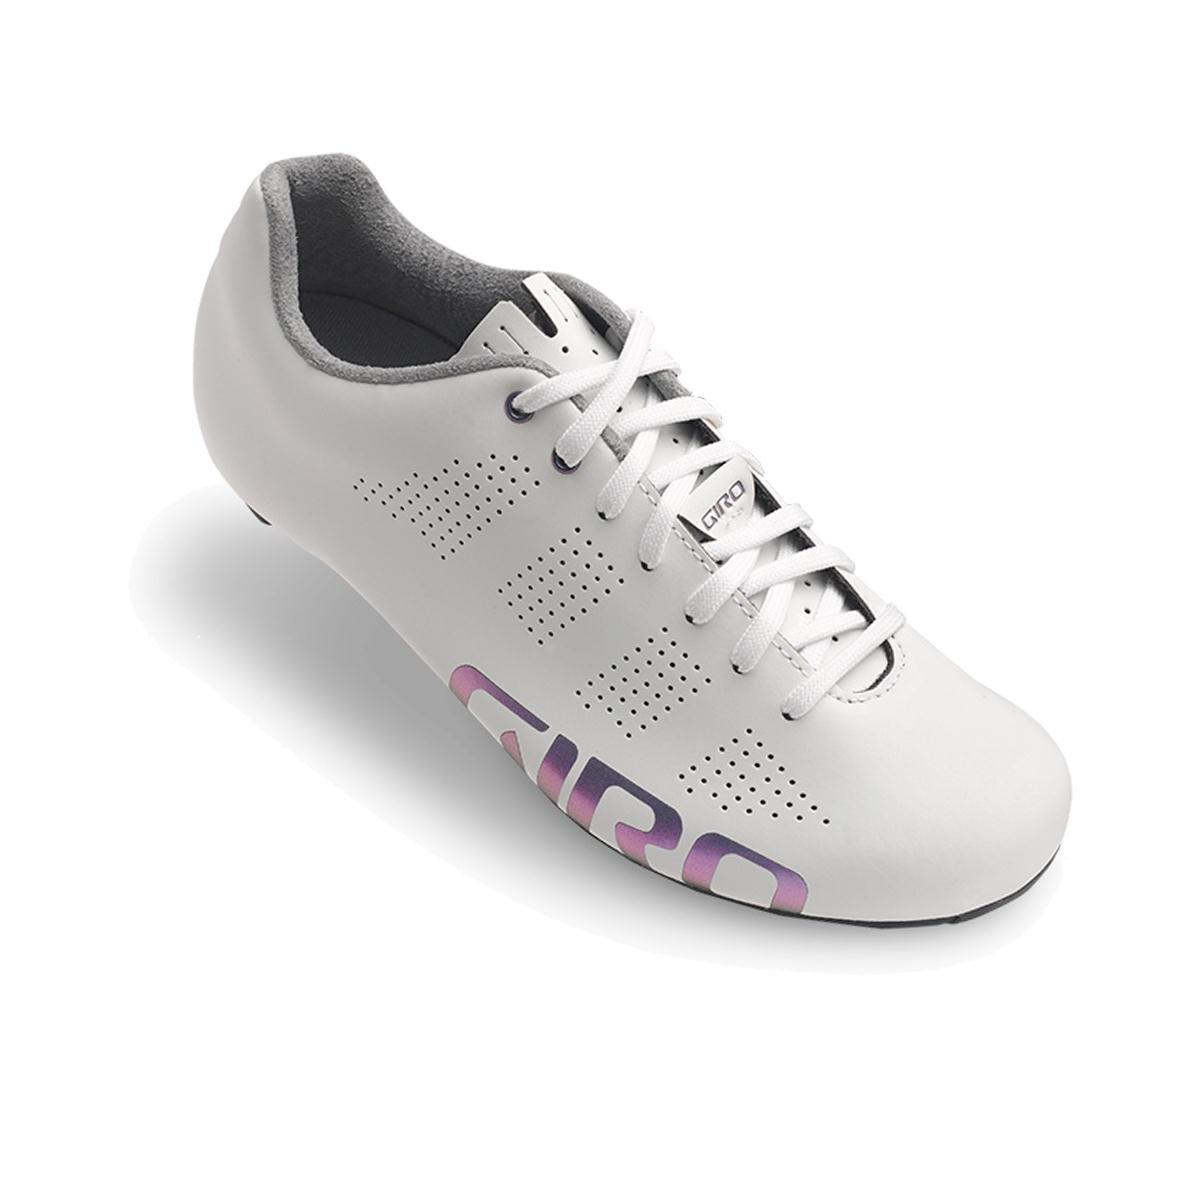 Giro Empire ACC WレディースCycling Road靴 B01M16D3SQ 39.5 EU|White Reflective White Reflective 39.5 EU